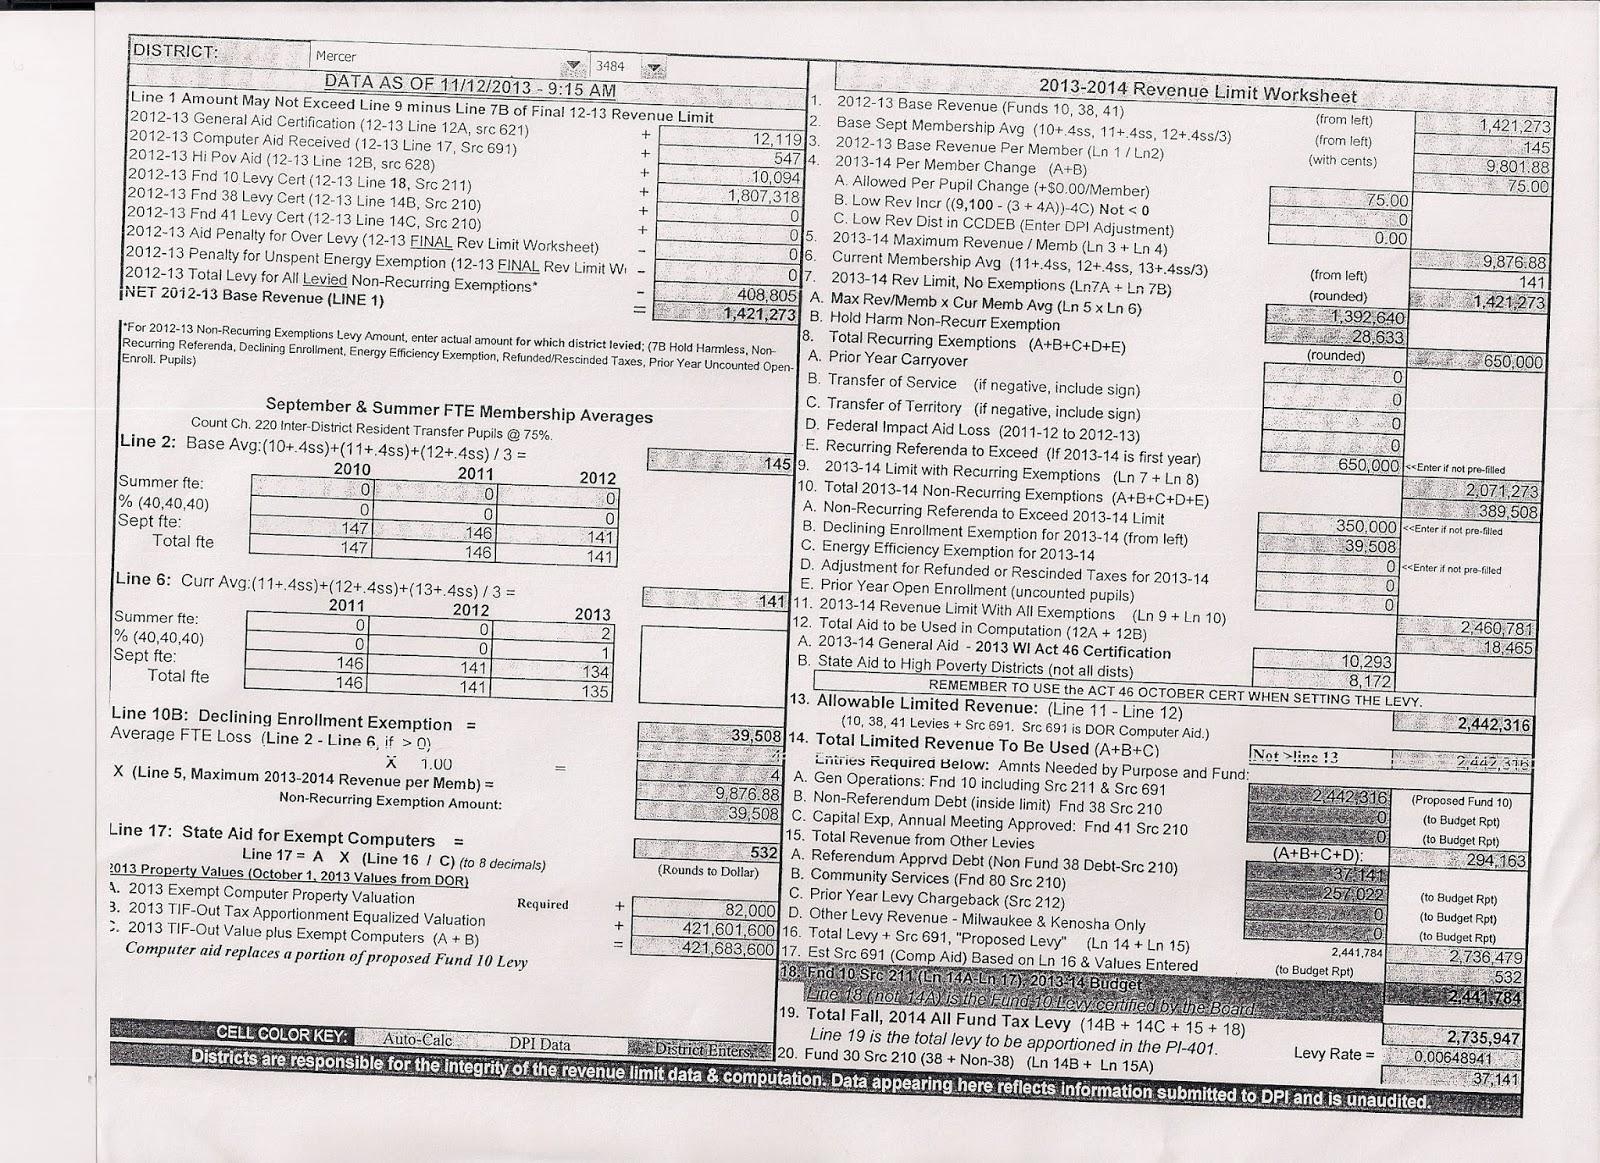 Mercer School Tax Levy Examined